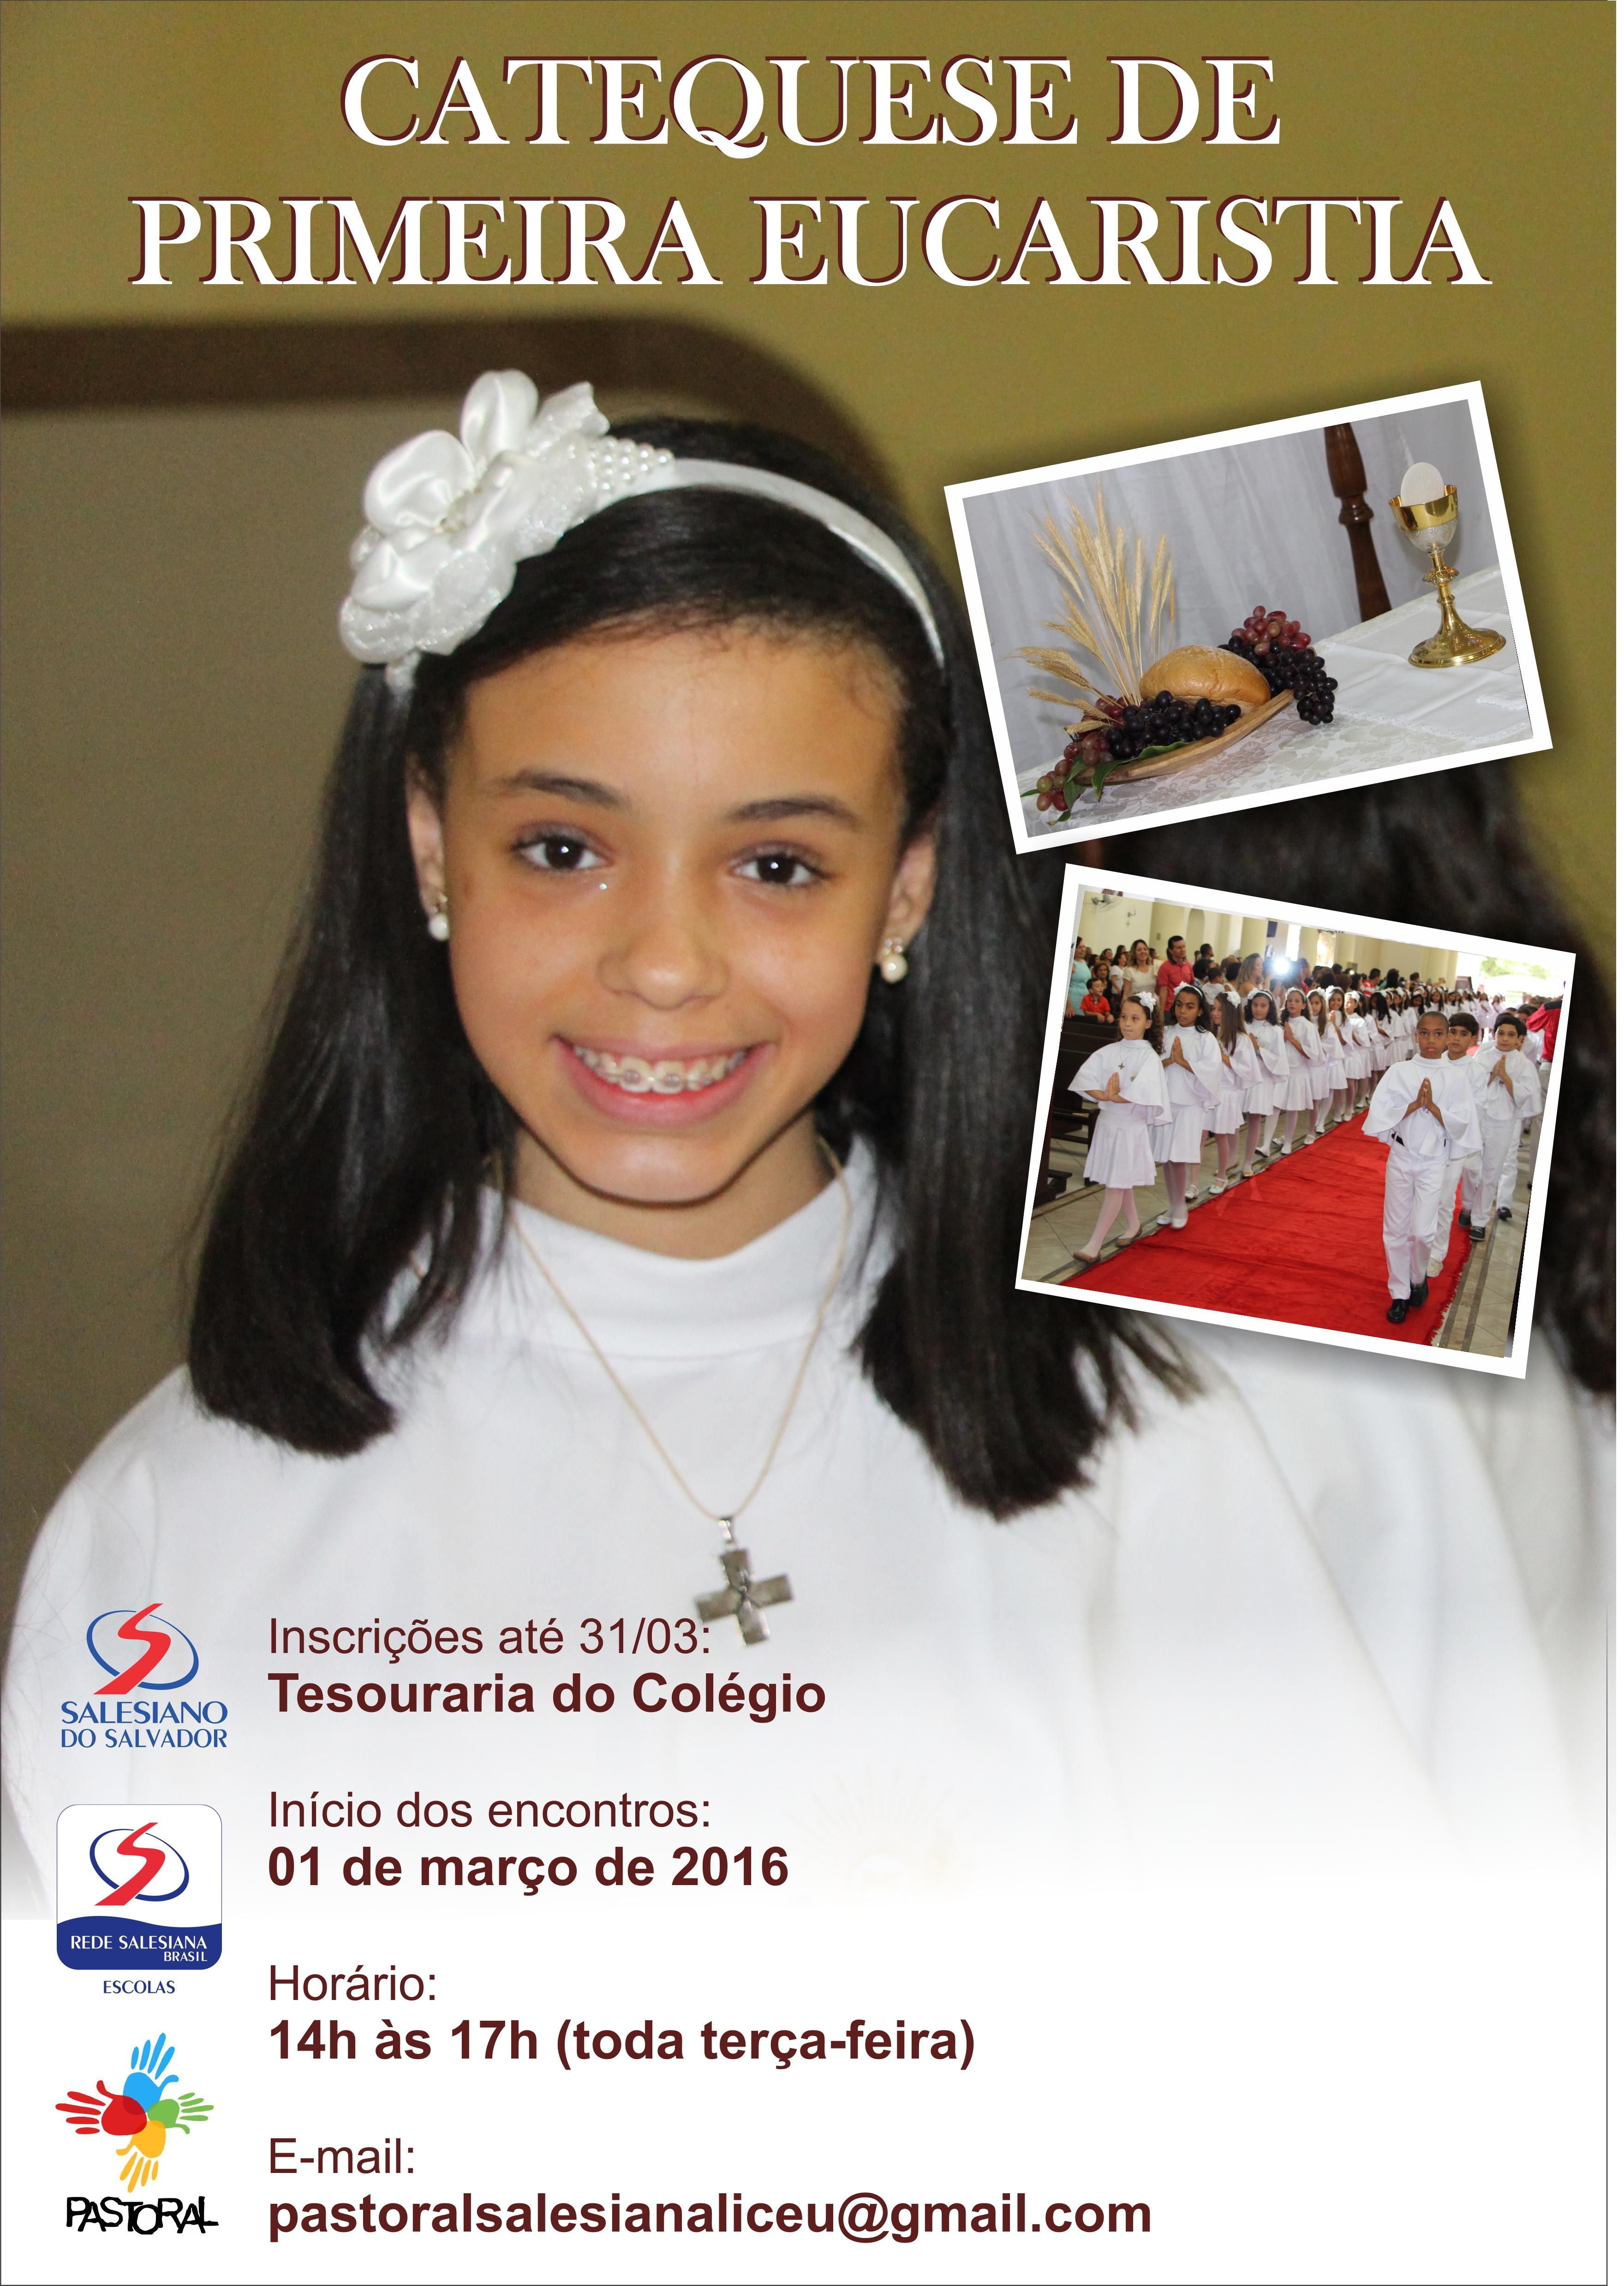 Catequese_de_1__eucaristia_2016